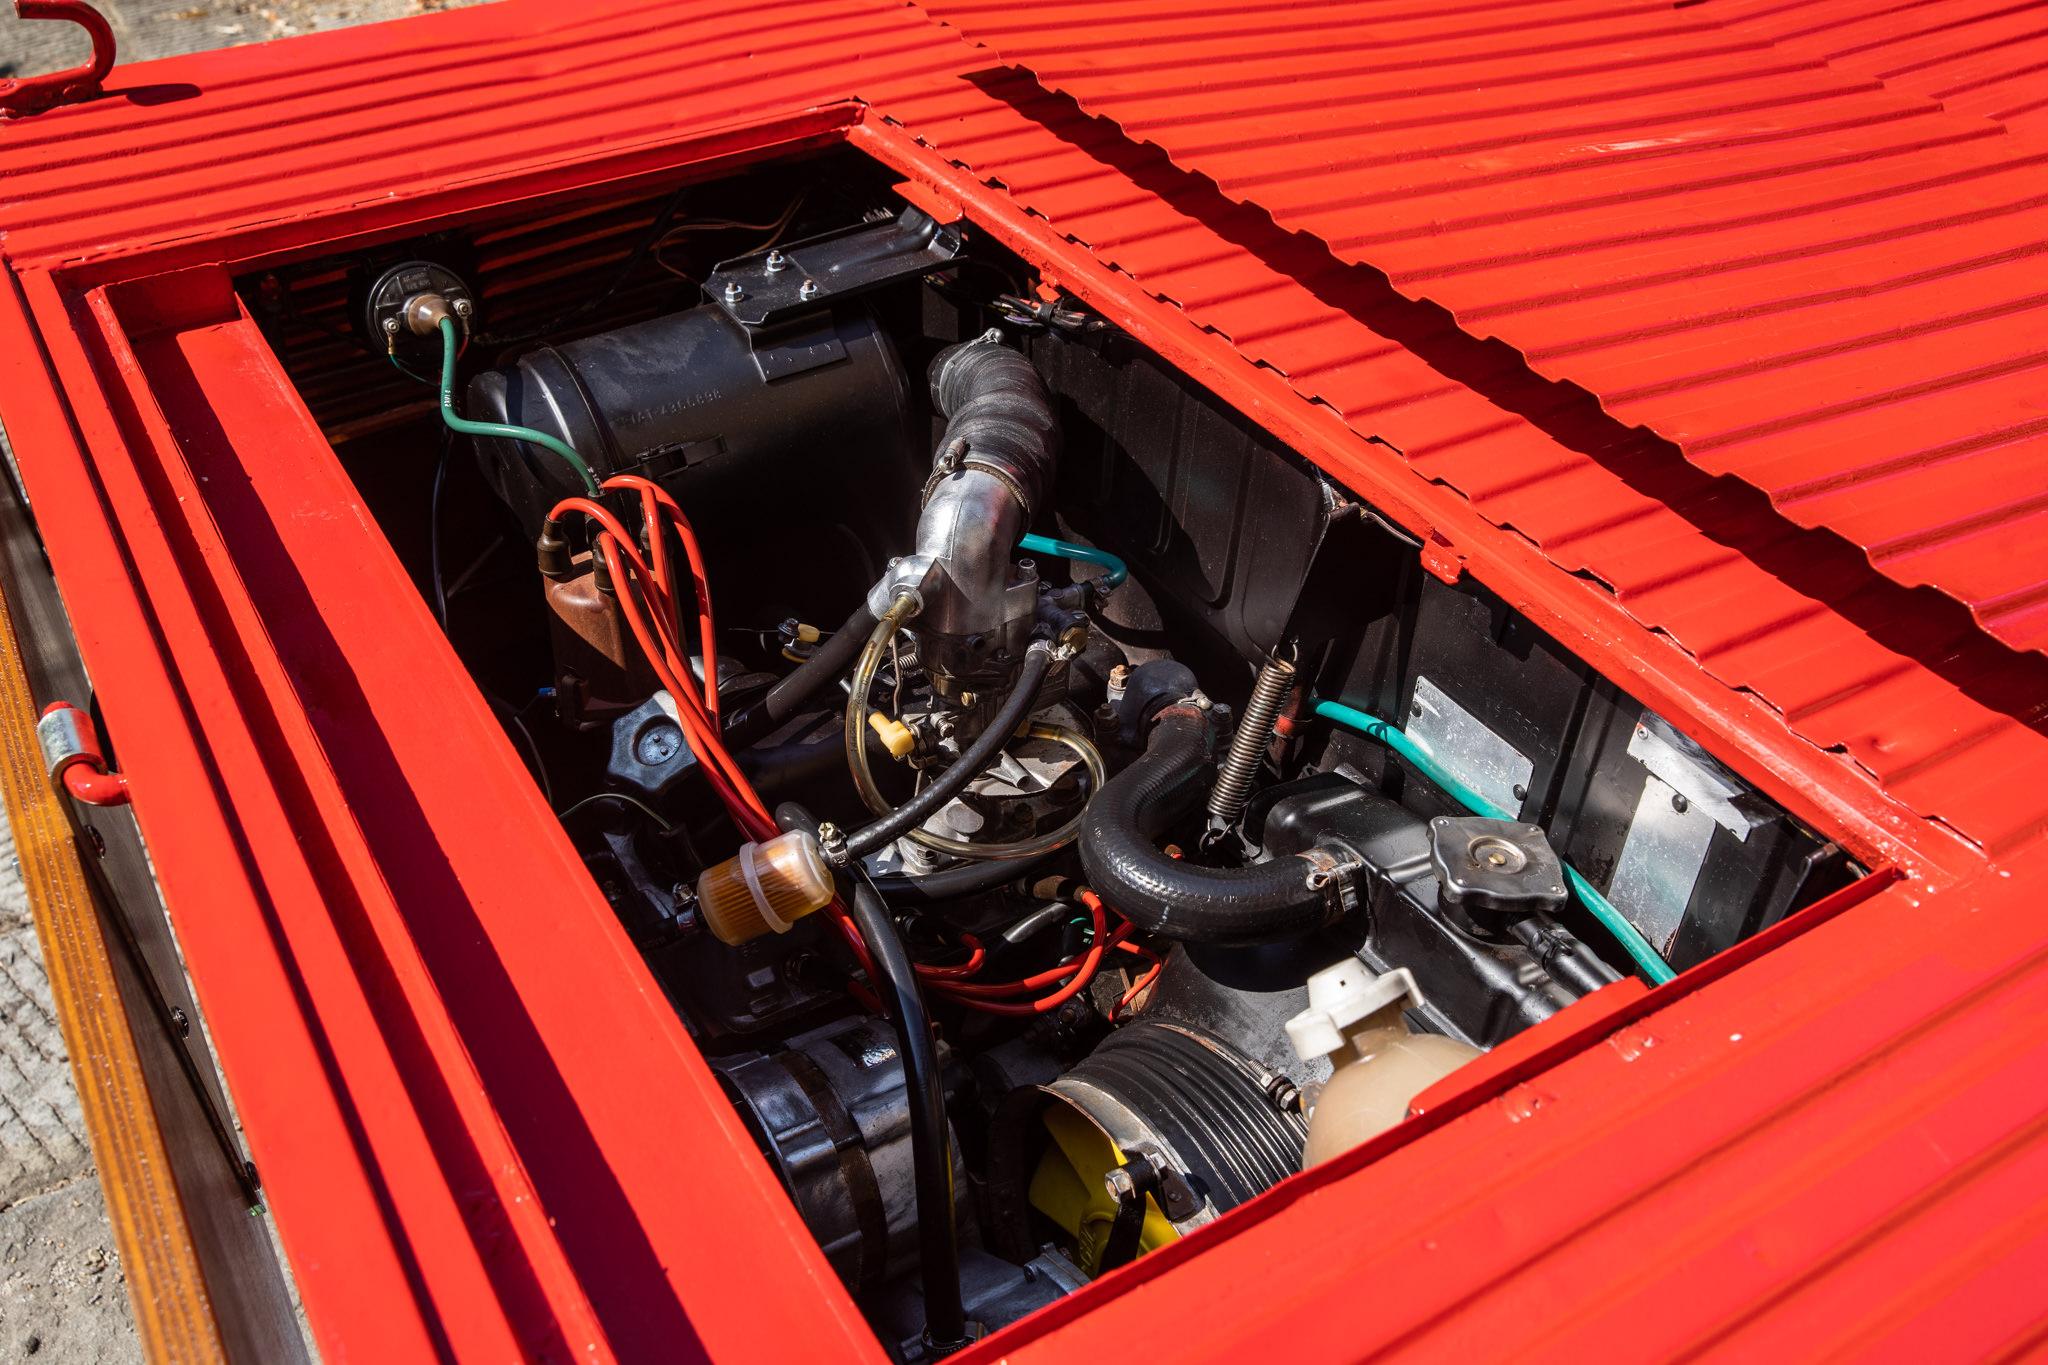 1977 Fiat 900 Coriasco Pickup engine